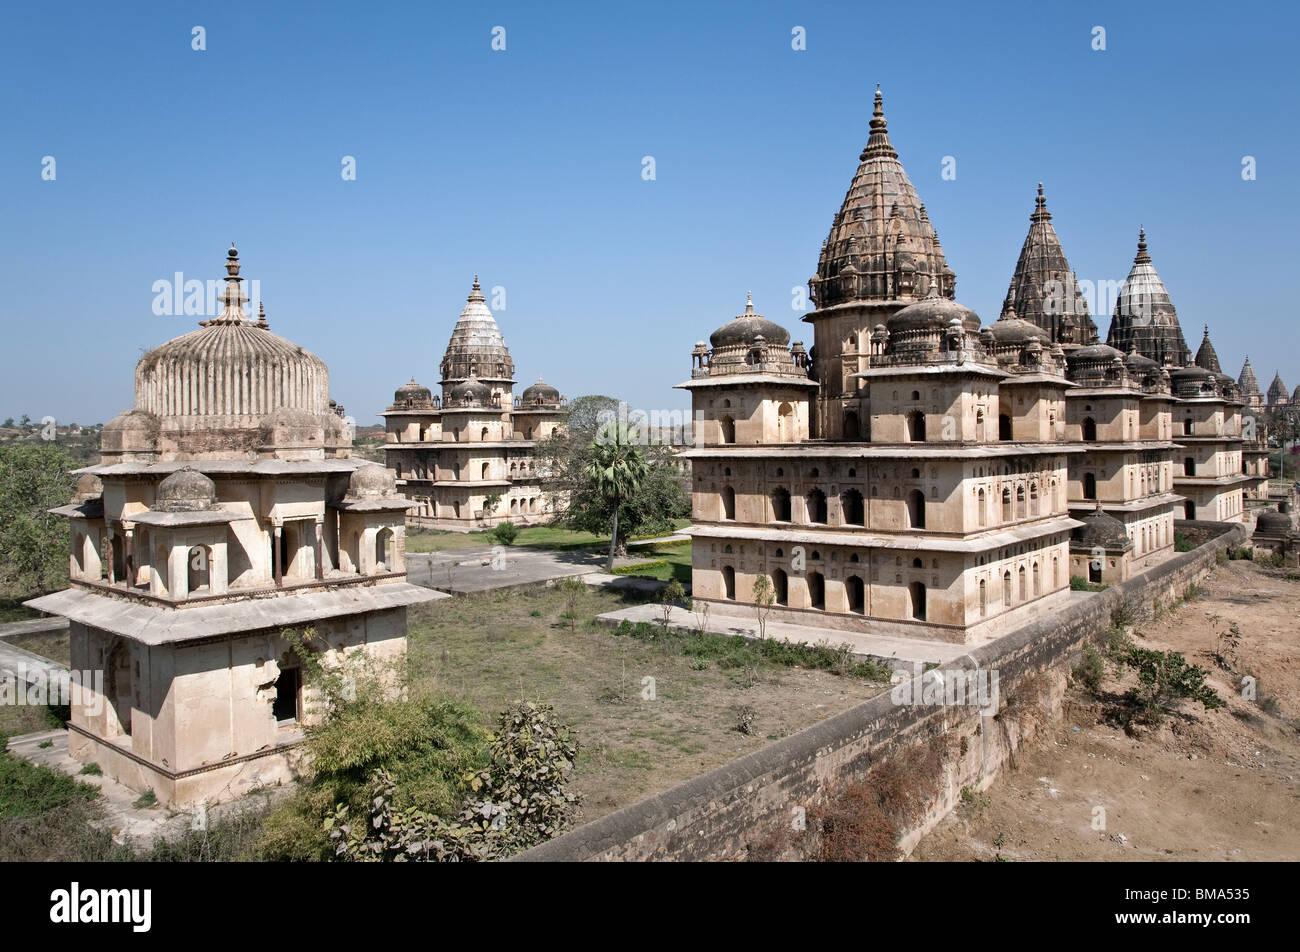 Royal cenotaphs. Orchha. Madhya Pradesh. India - Stock Image